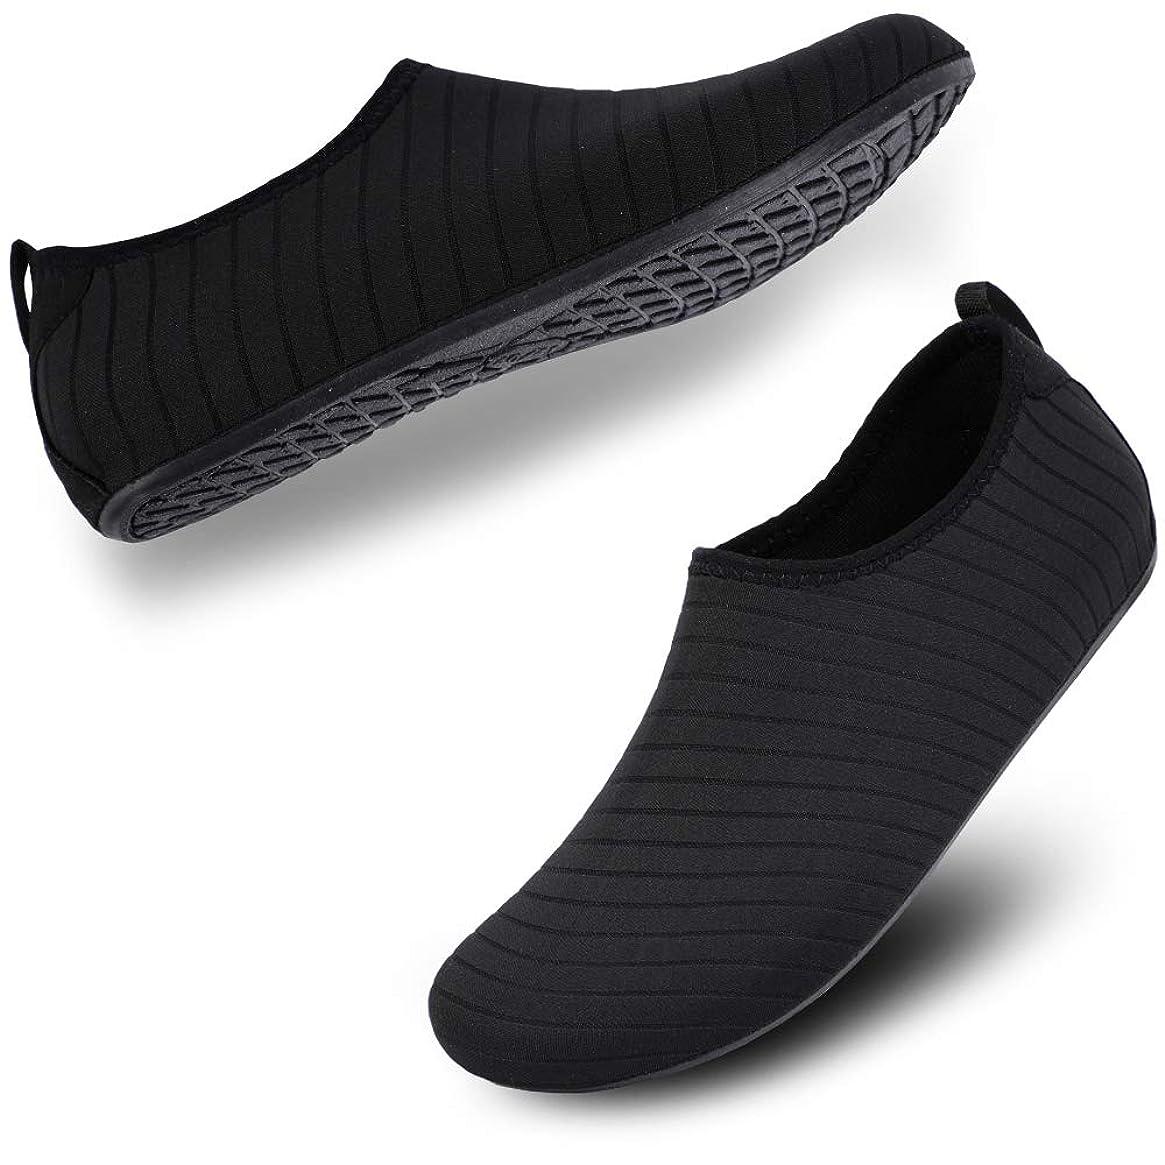 Lyncxx Women's Water Shoes Aqua Socks Quick-Dry Marine Shoes Barefoot Swim Shoes for Beach, Pool, Surf, Diving, Yoga